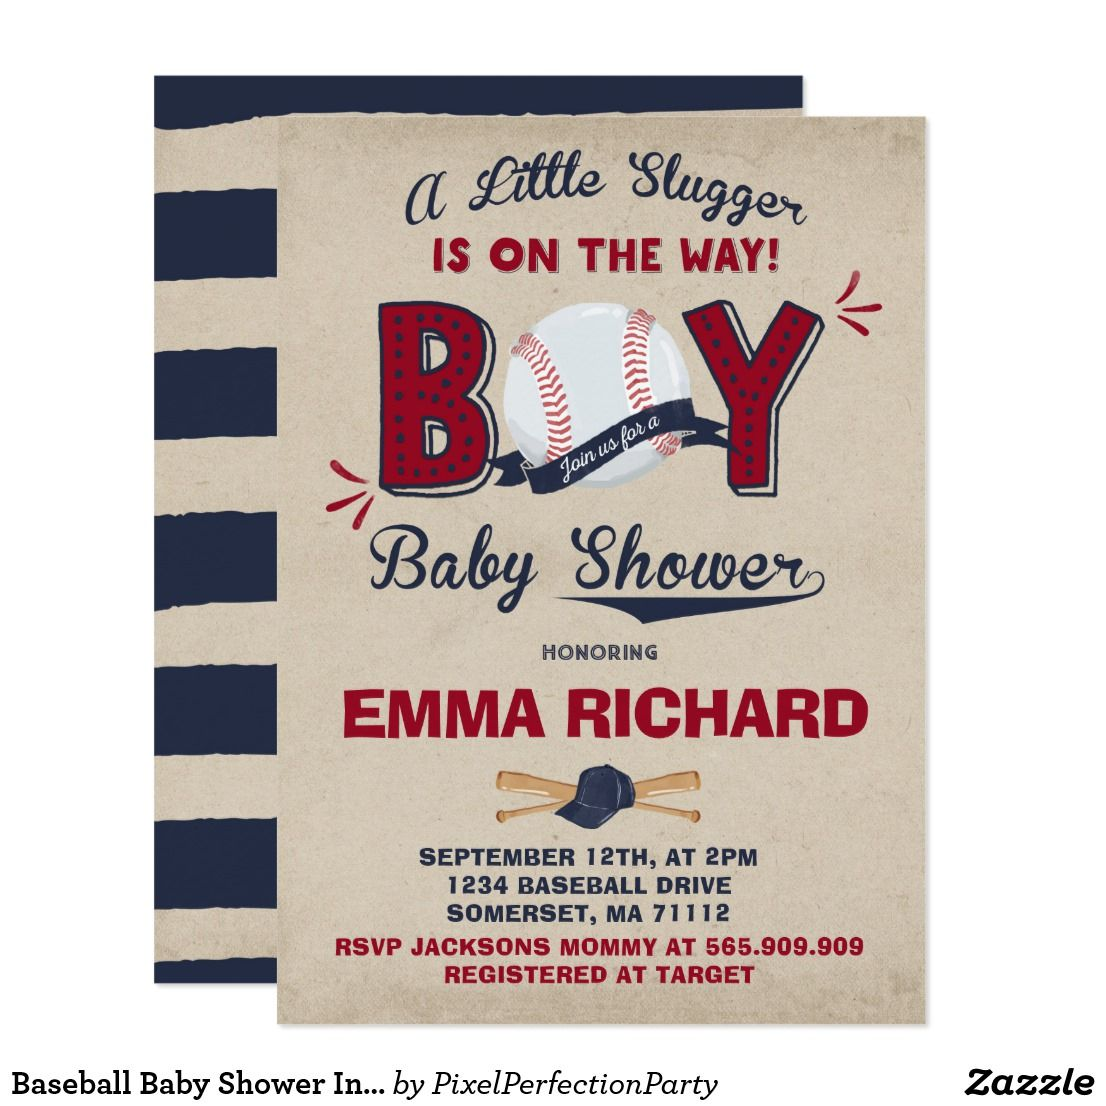 Baseball Baby Shower Invitation Baseball Shower A perfect Way to ...